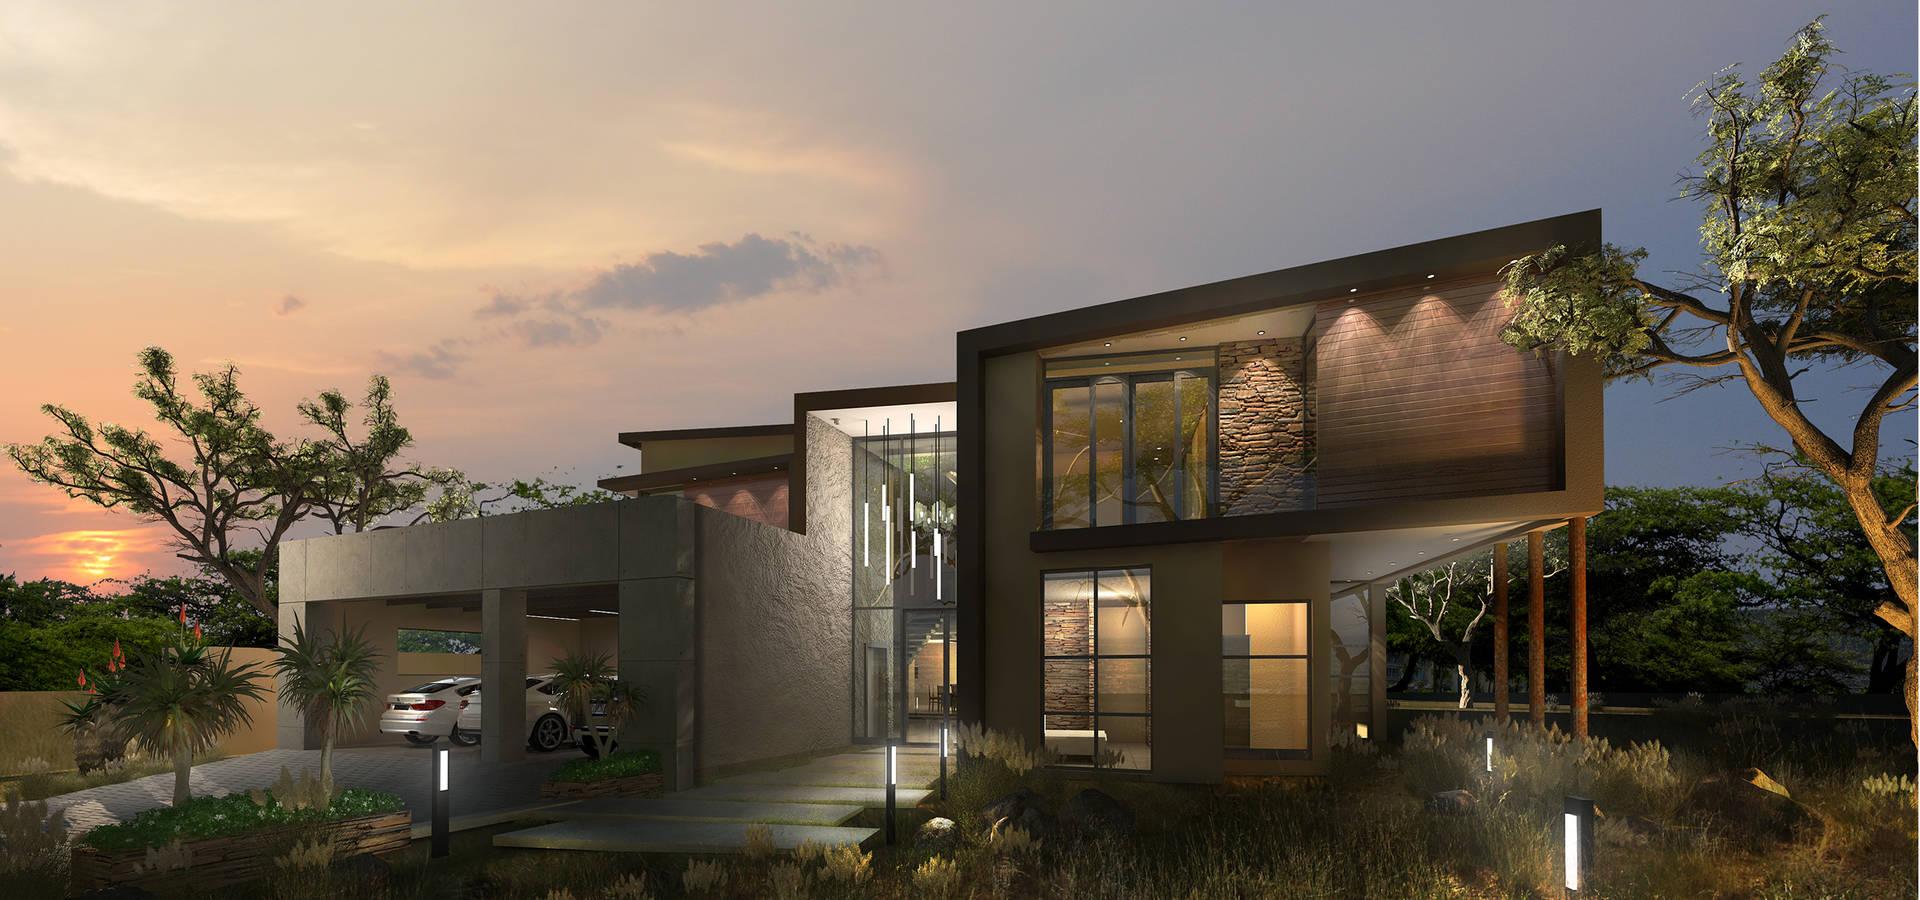 Koen and Associates Architecture